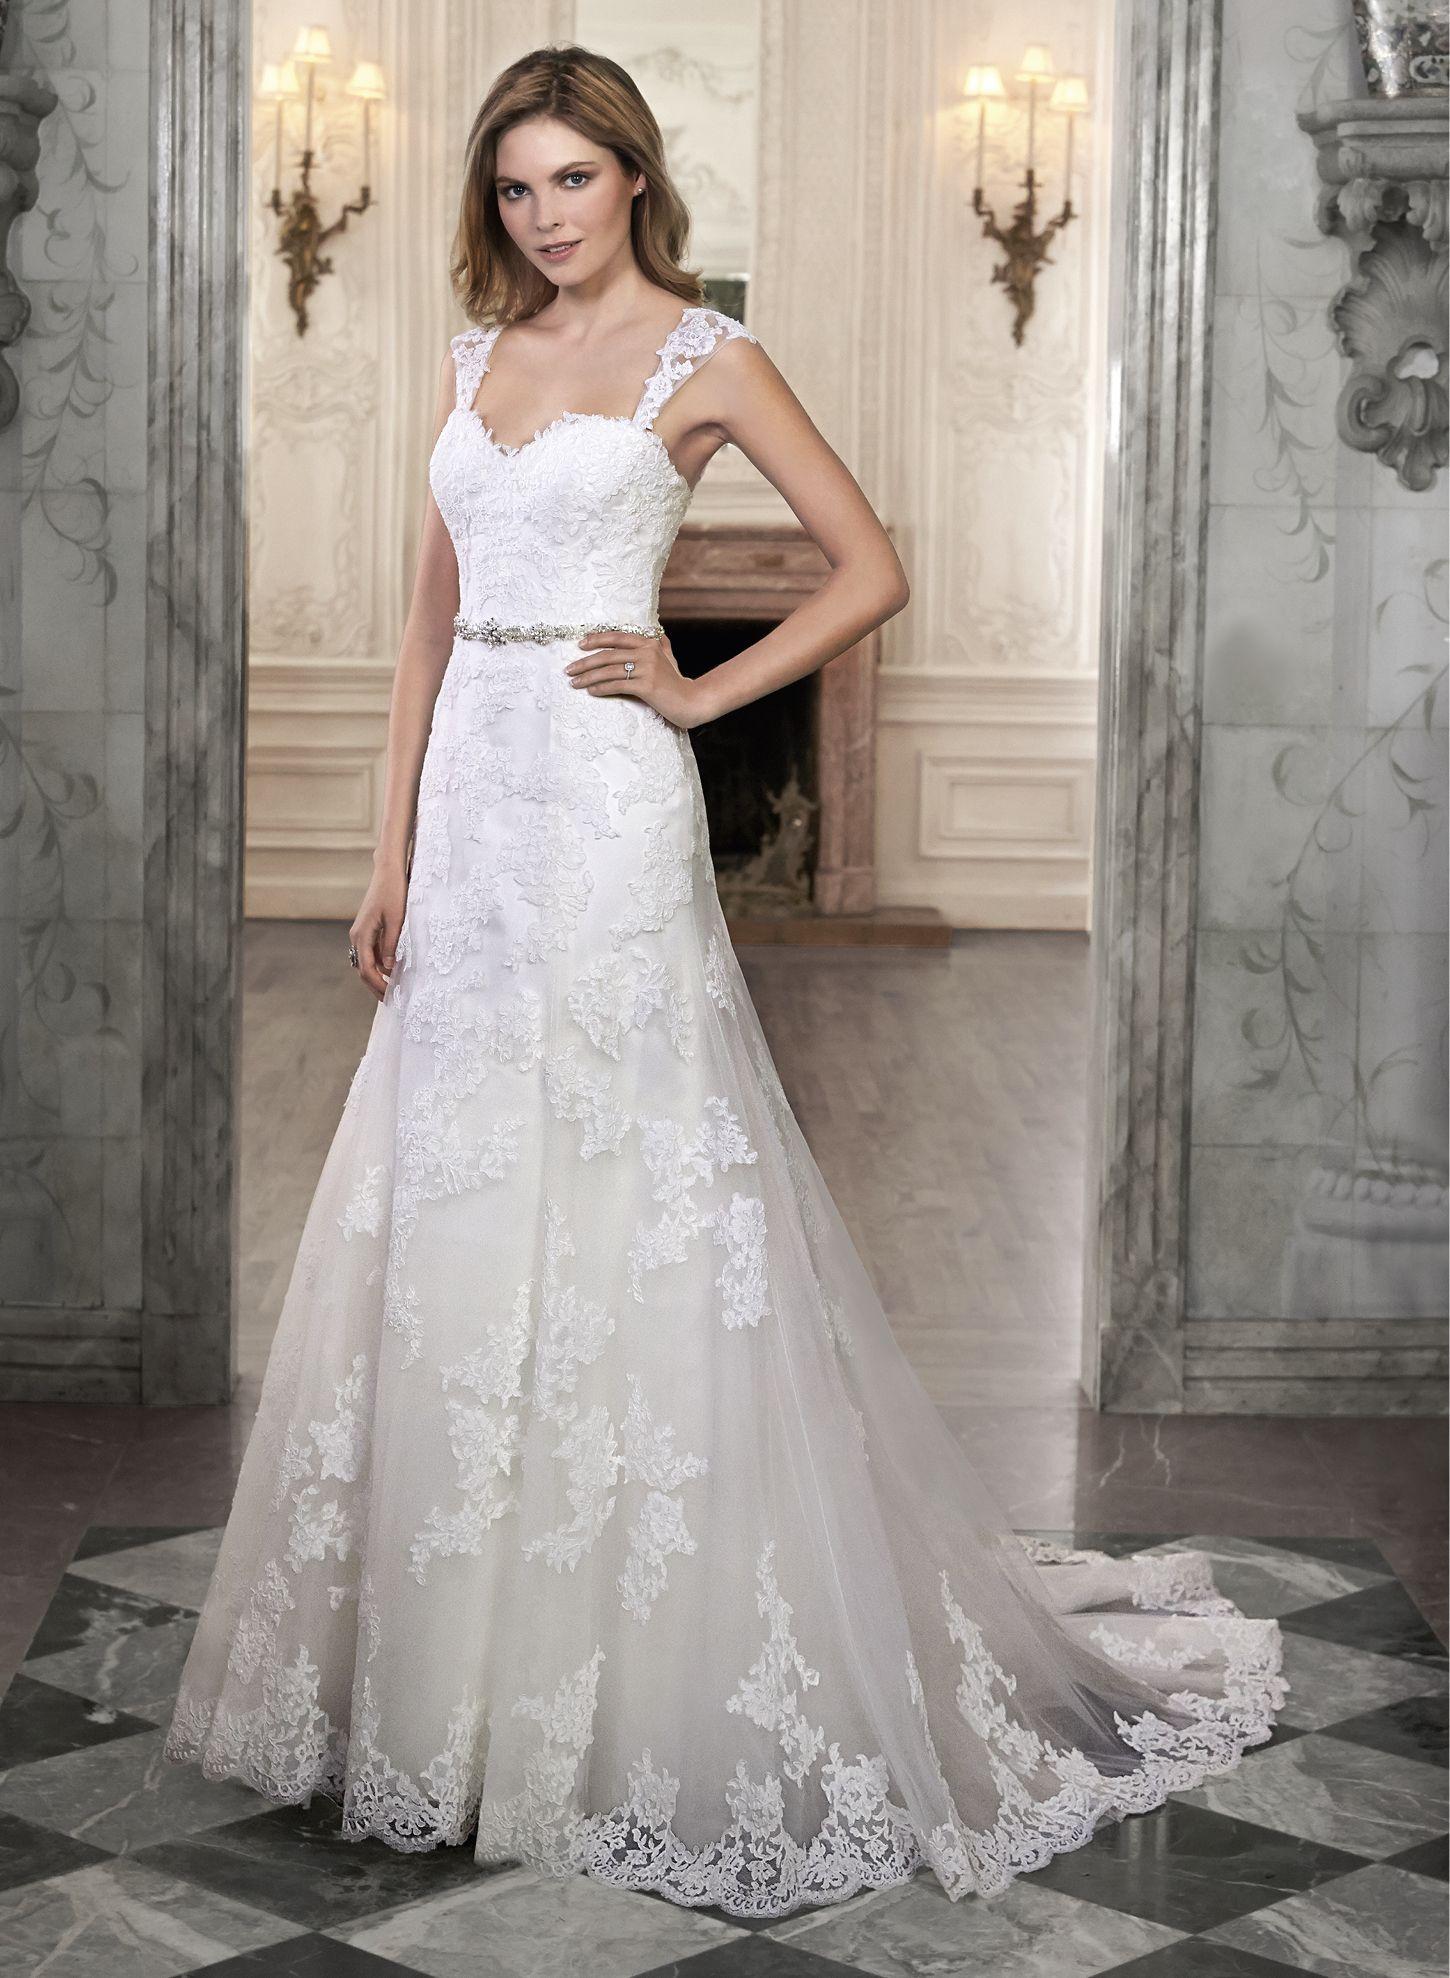 Delicieux Price Range Of Maggie Sottero Wedding Dresses